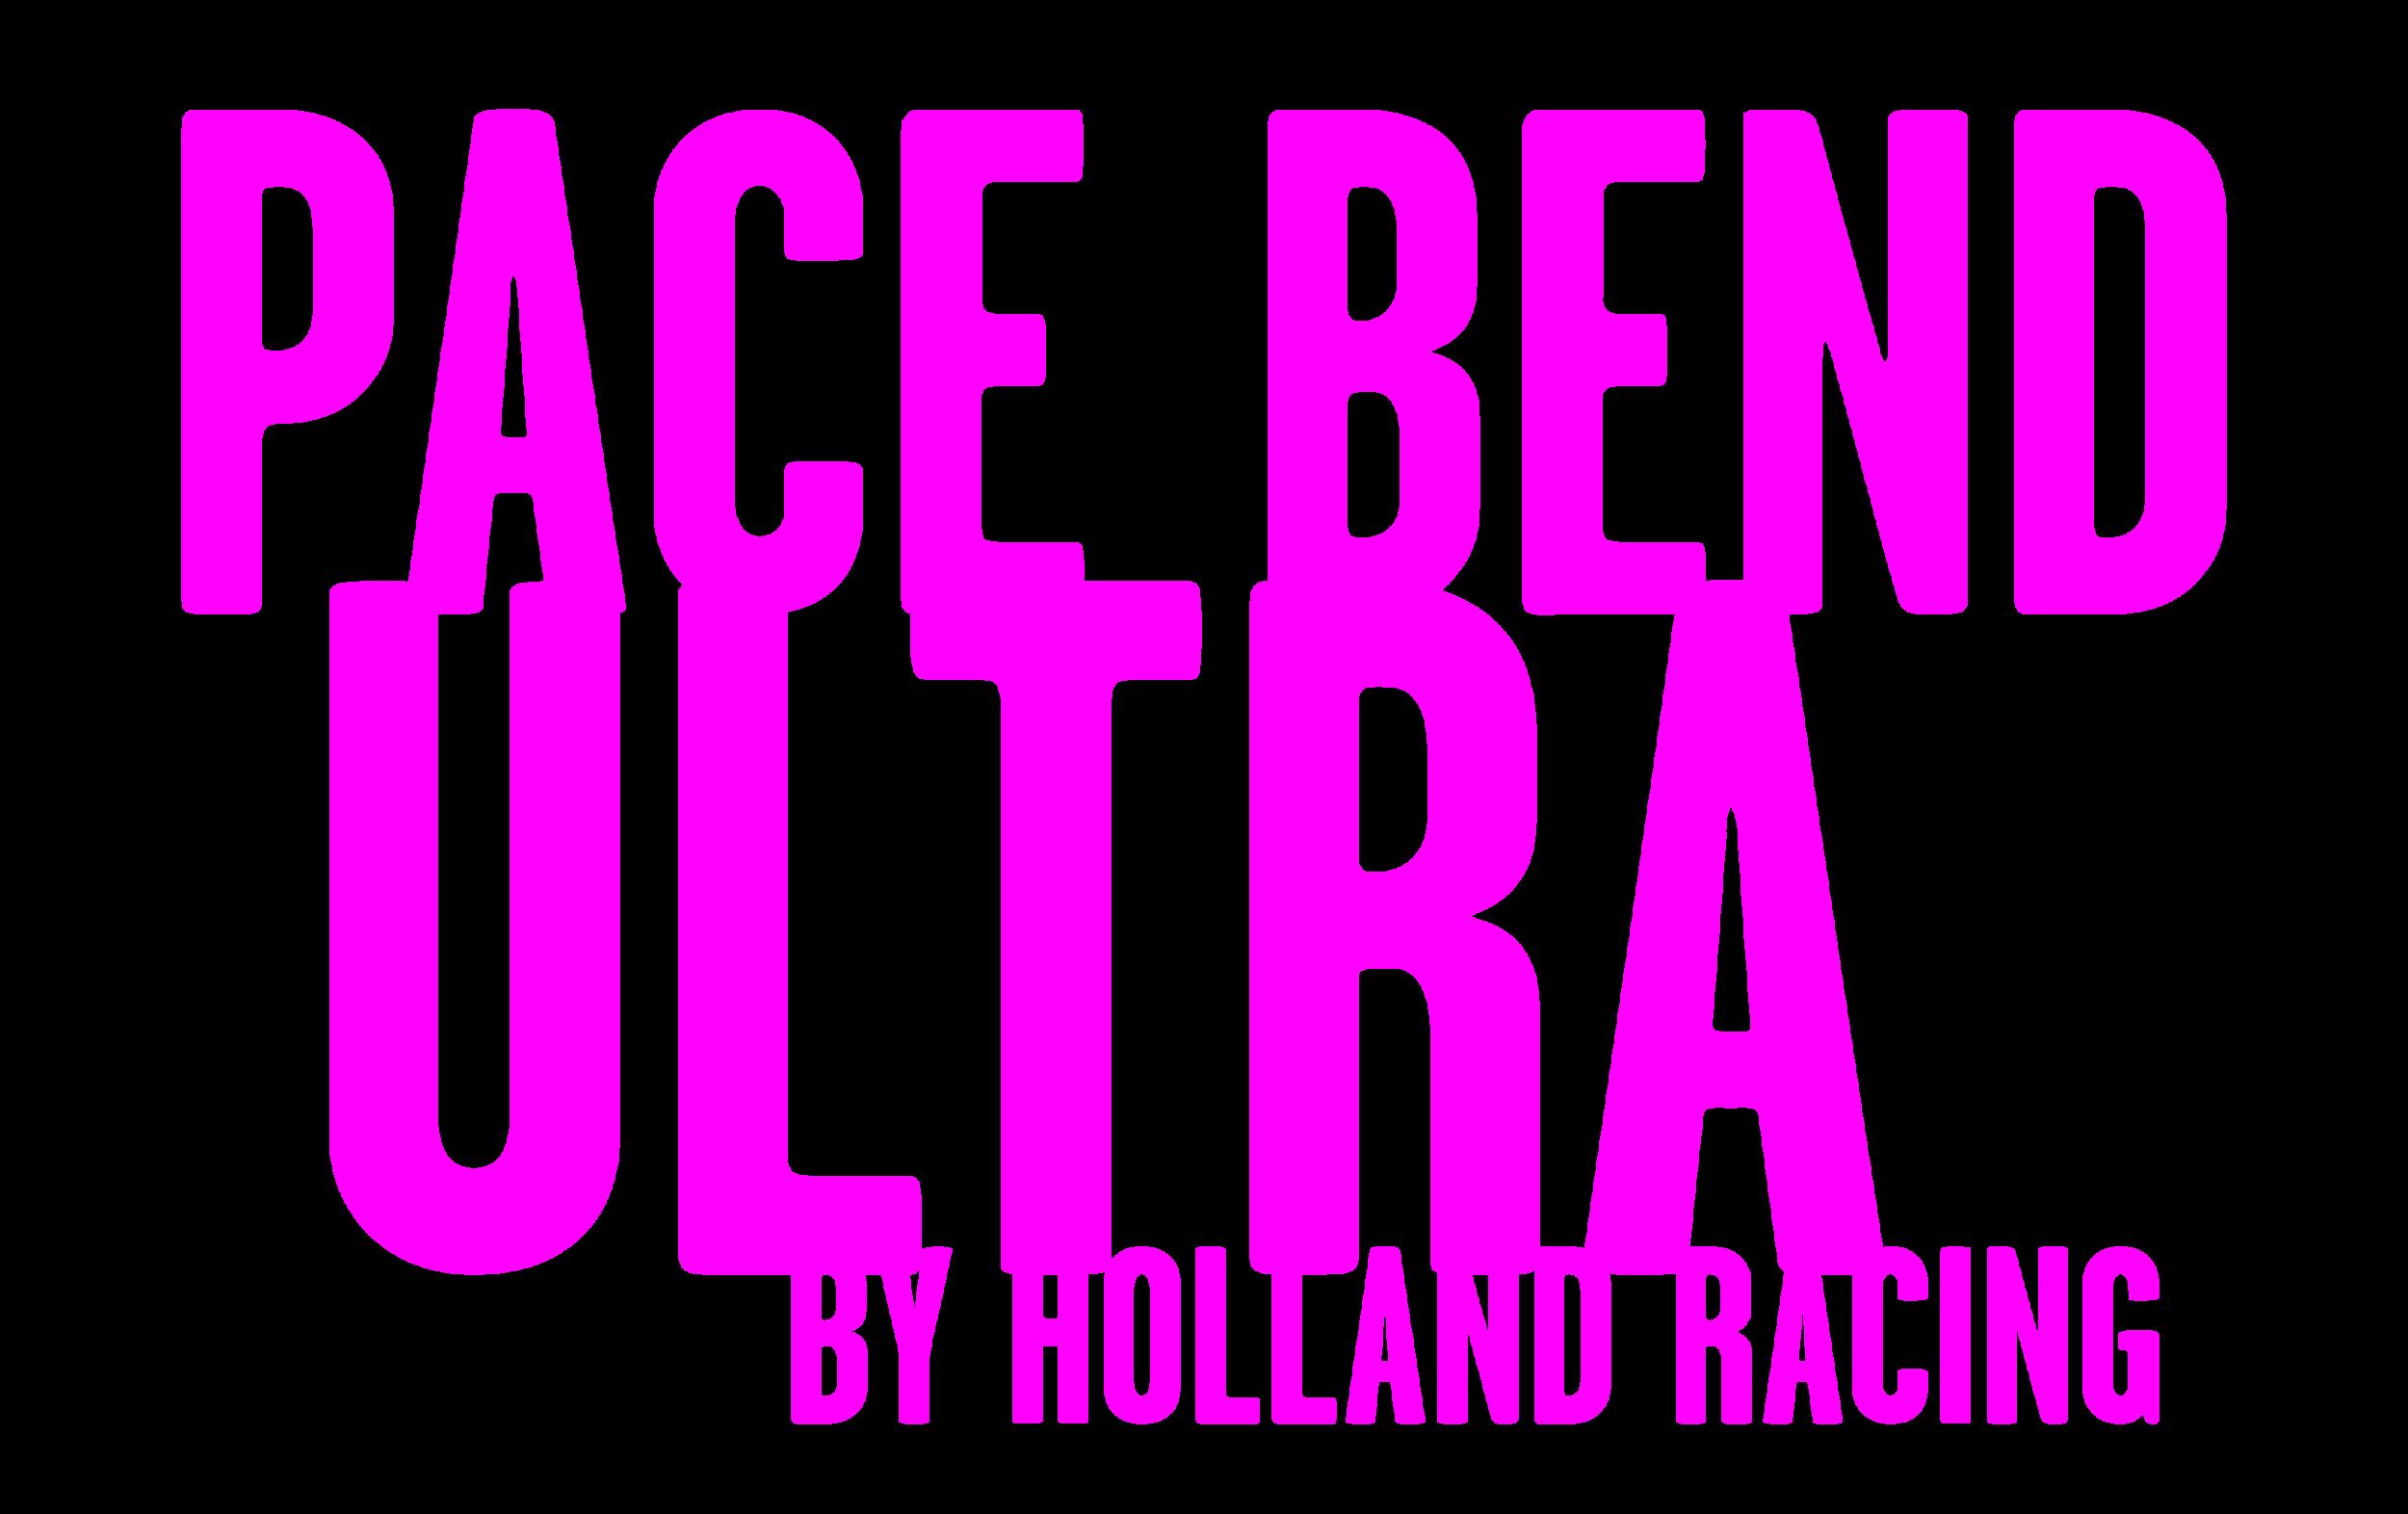 Feb 2-3, 2010 - 3 -6-12-24 Hour Races